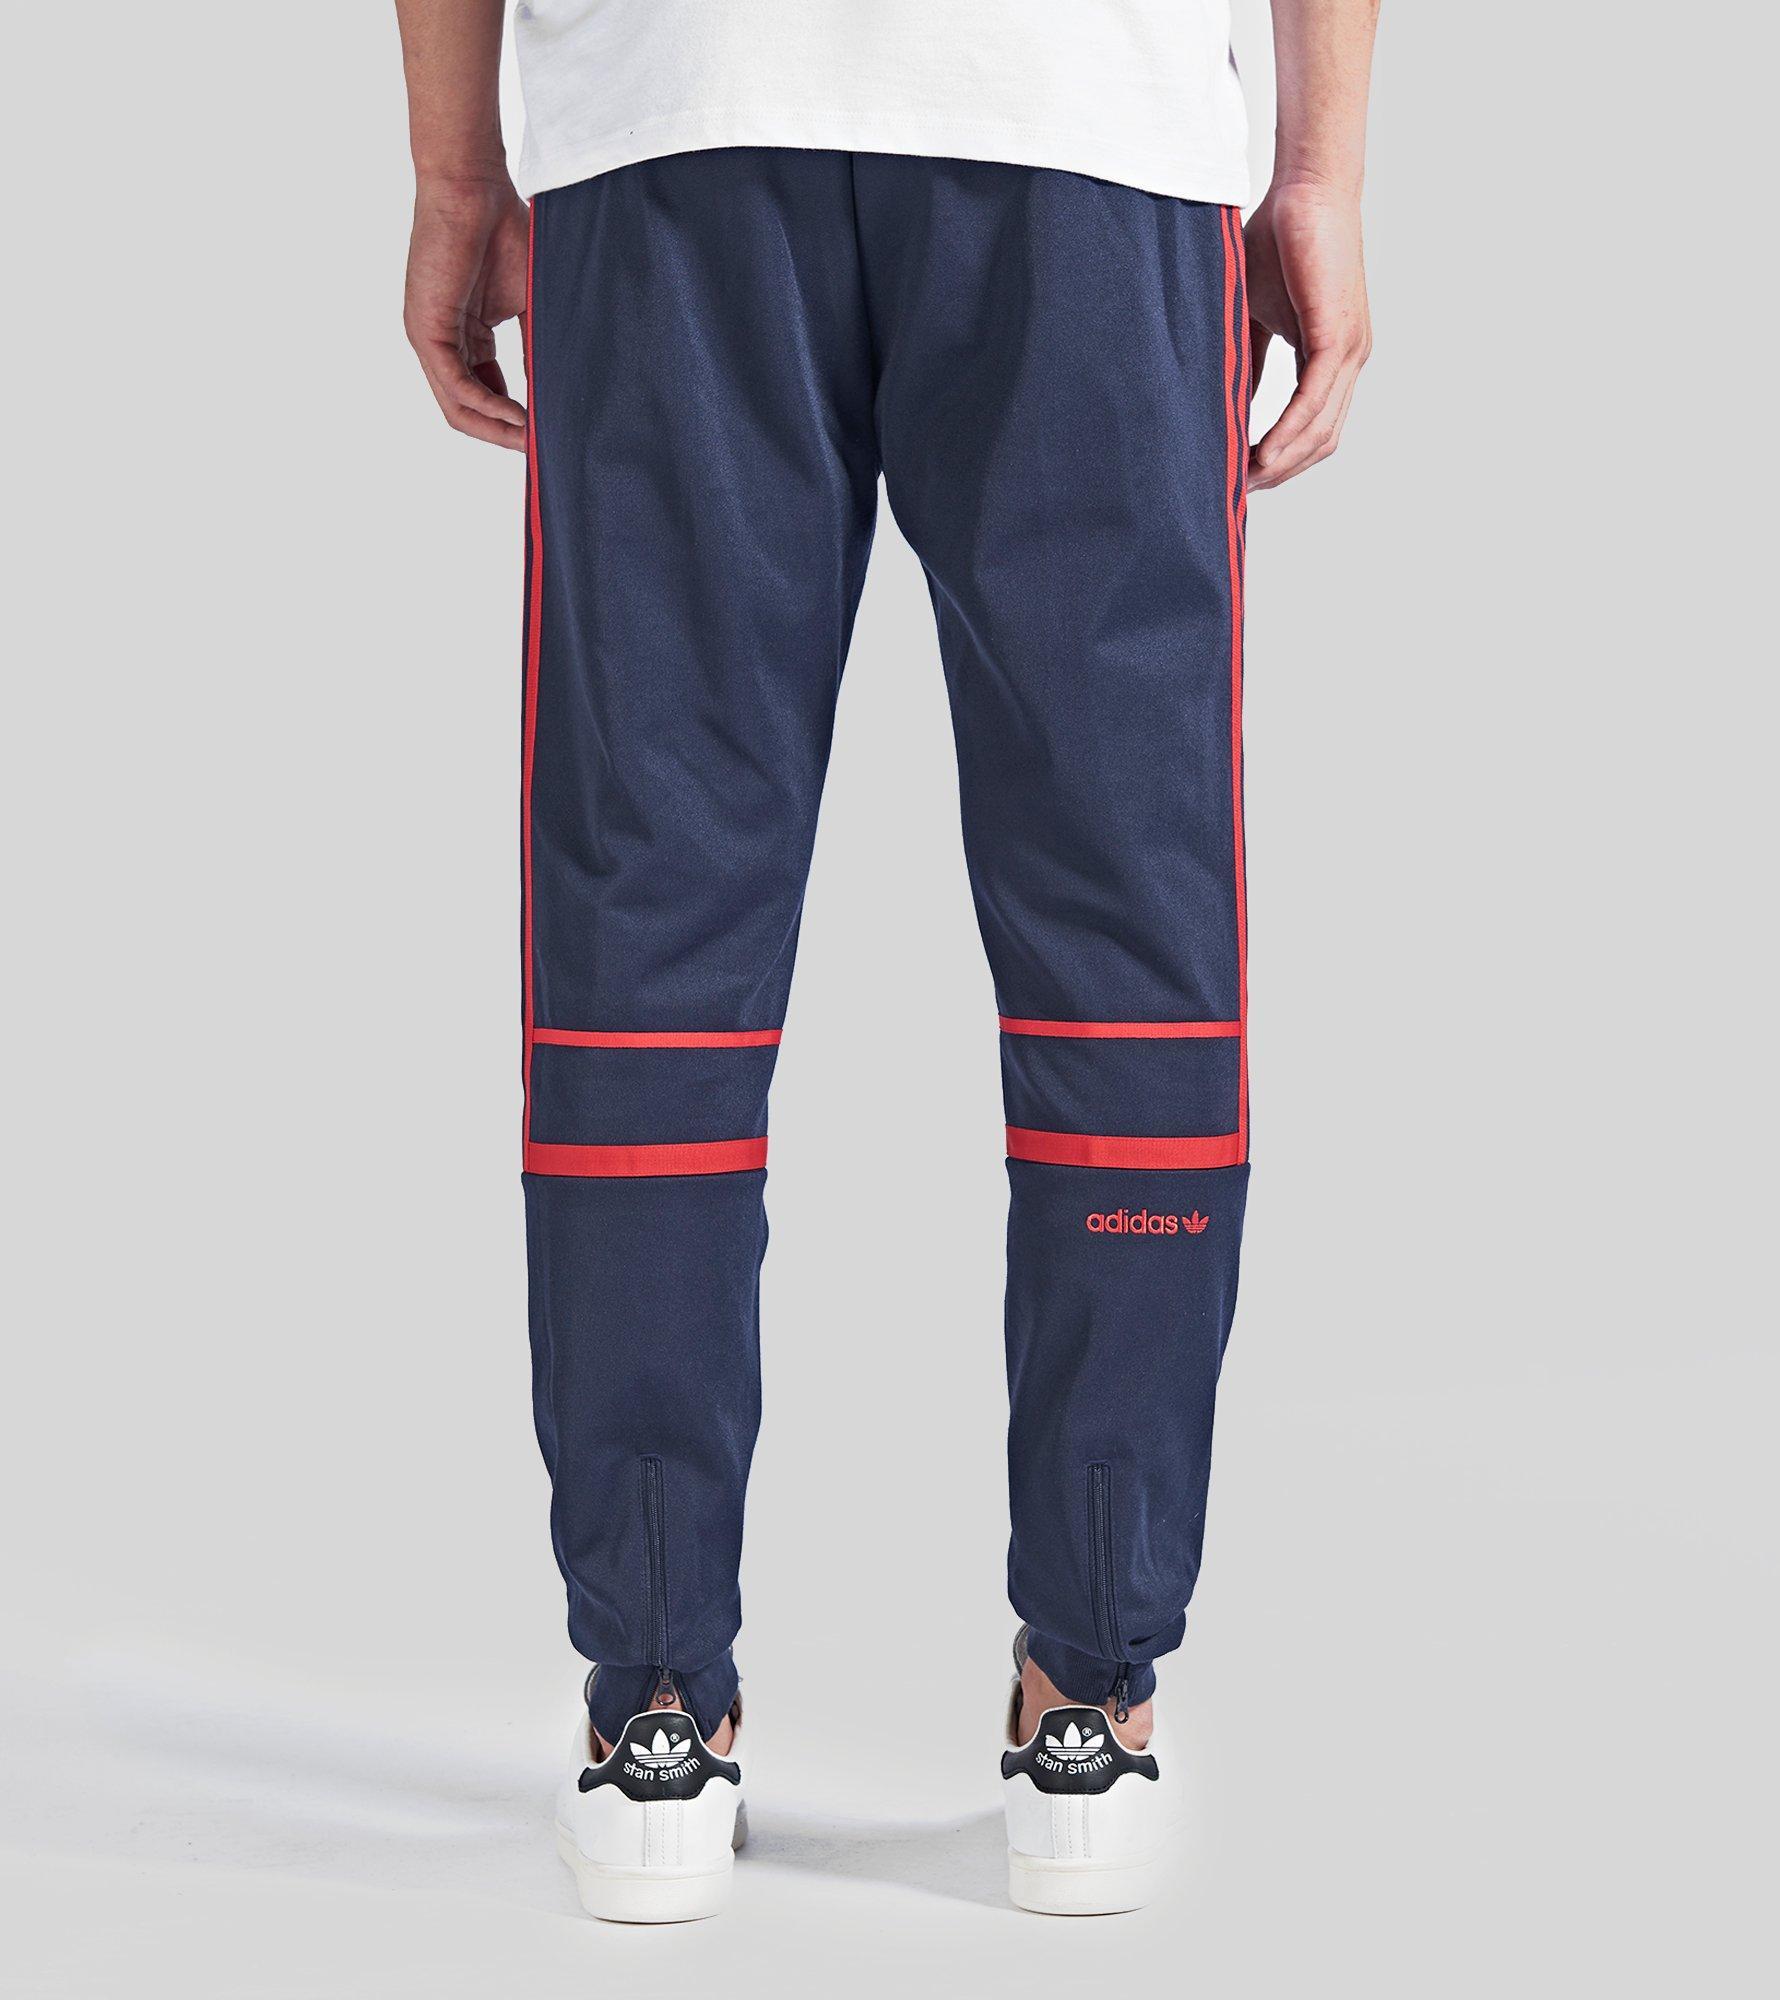 adidas challenger track pants